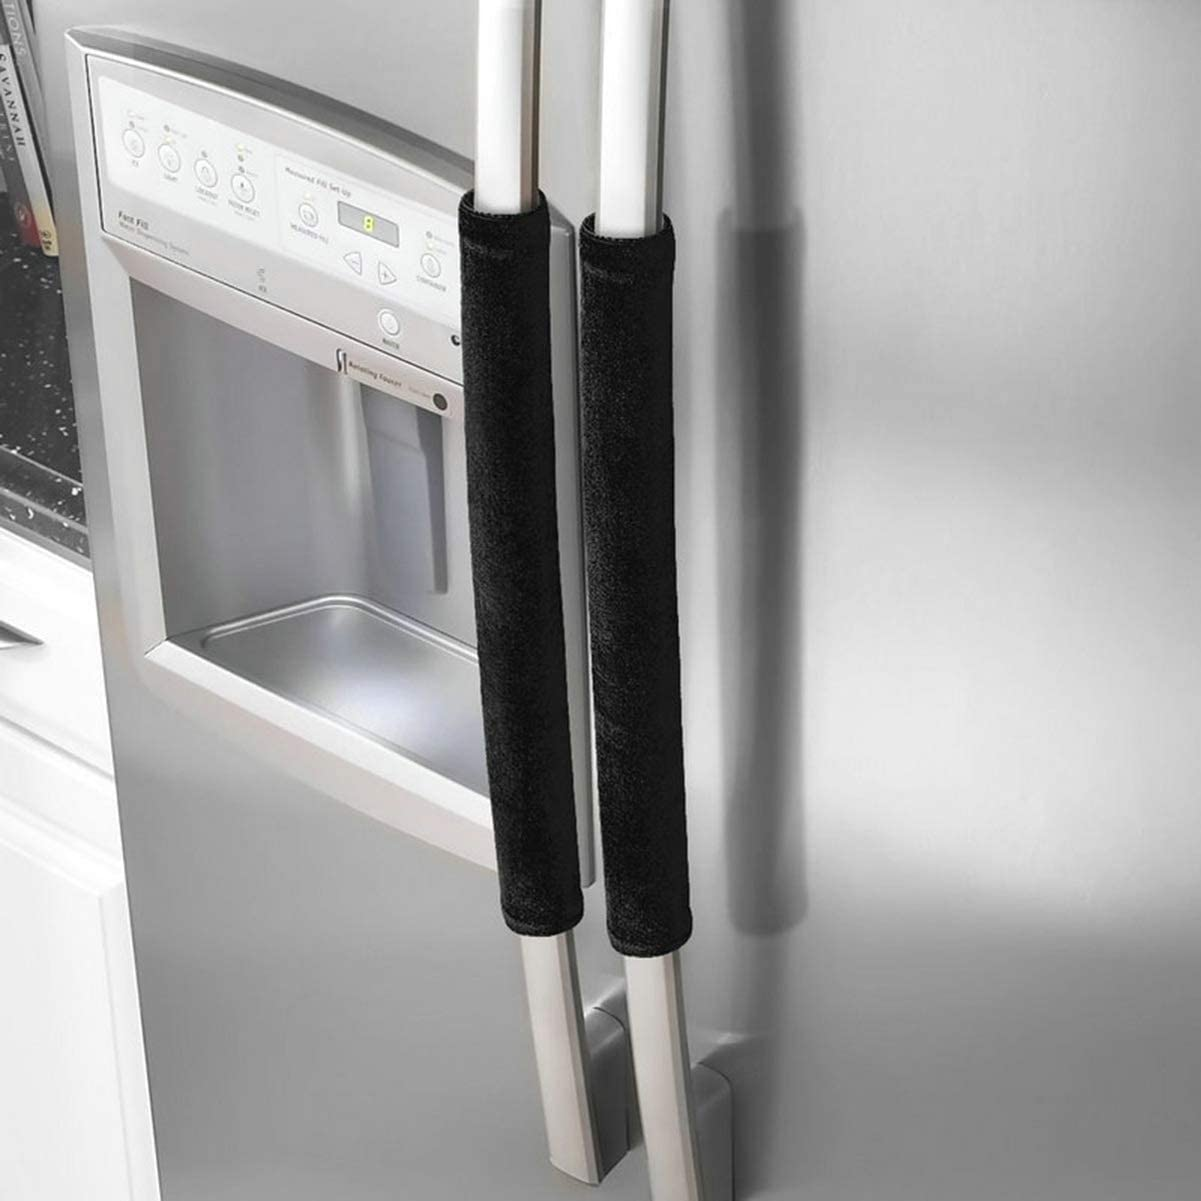 VOSAREA Refrigerator Door Handle Covers,2pcs Antiskid Protector Gloves Kitchen Appliance Covers for Refrigerator Door Microwave Dishwasher (Black)